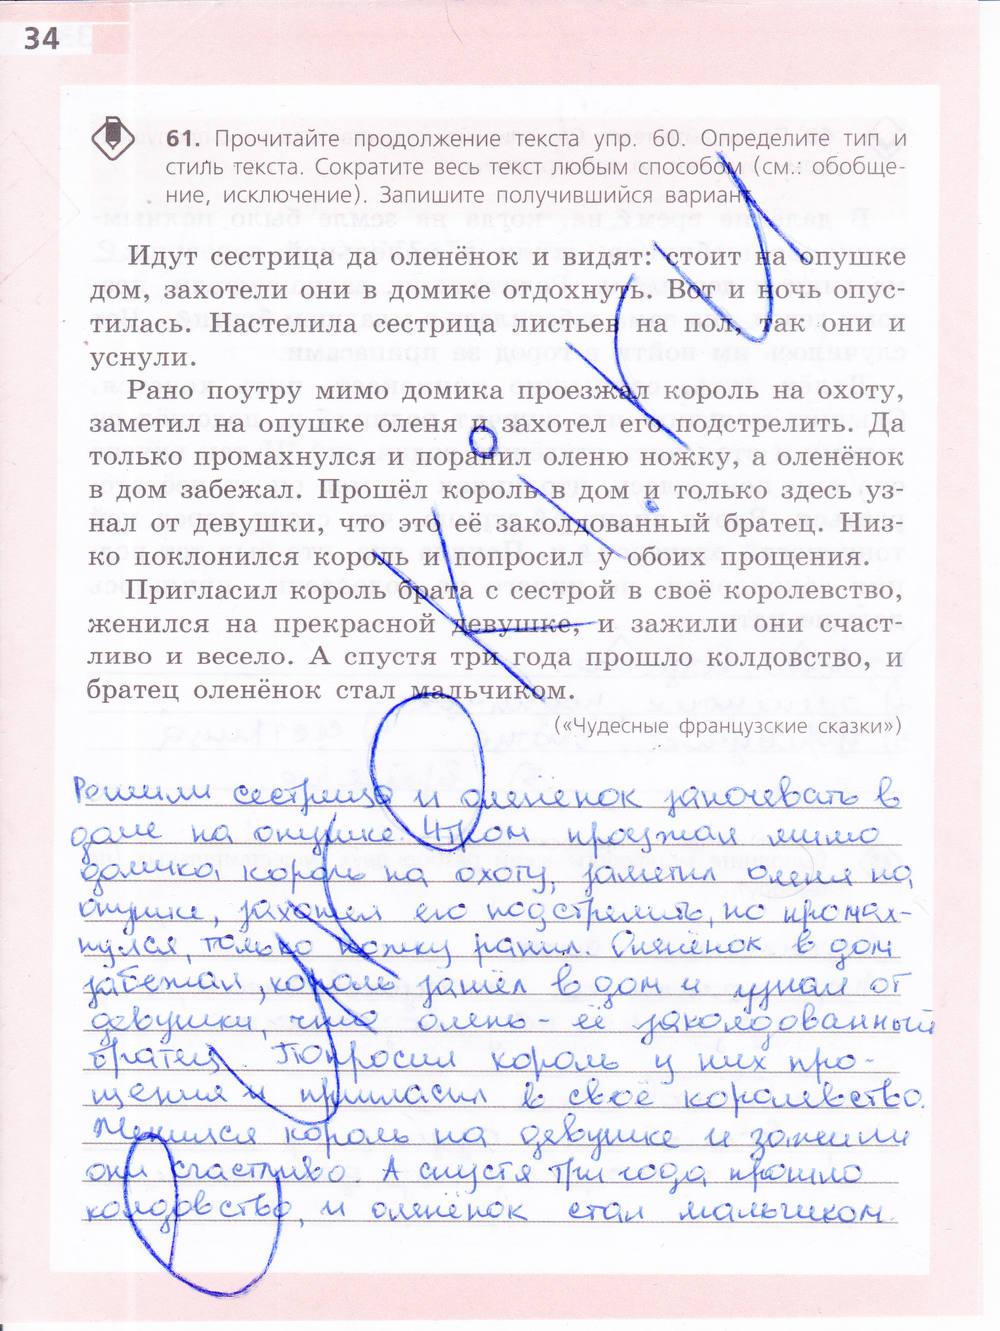 Гдз По Русскому Языку За 6 Класс Ефремова Е.а Рабочая Тетрадь